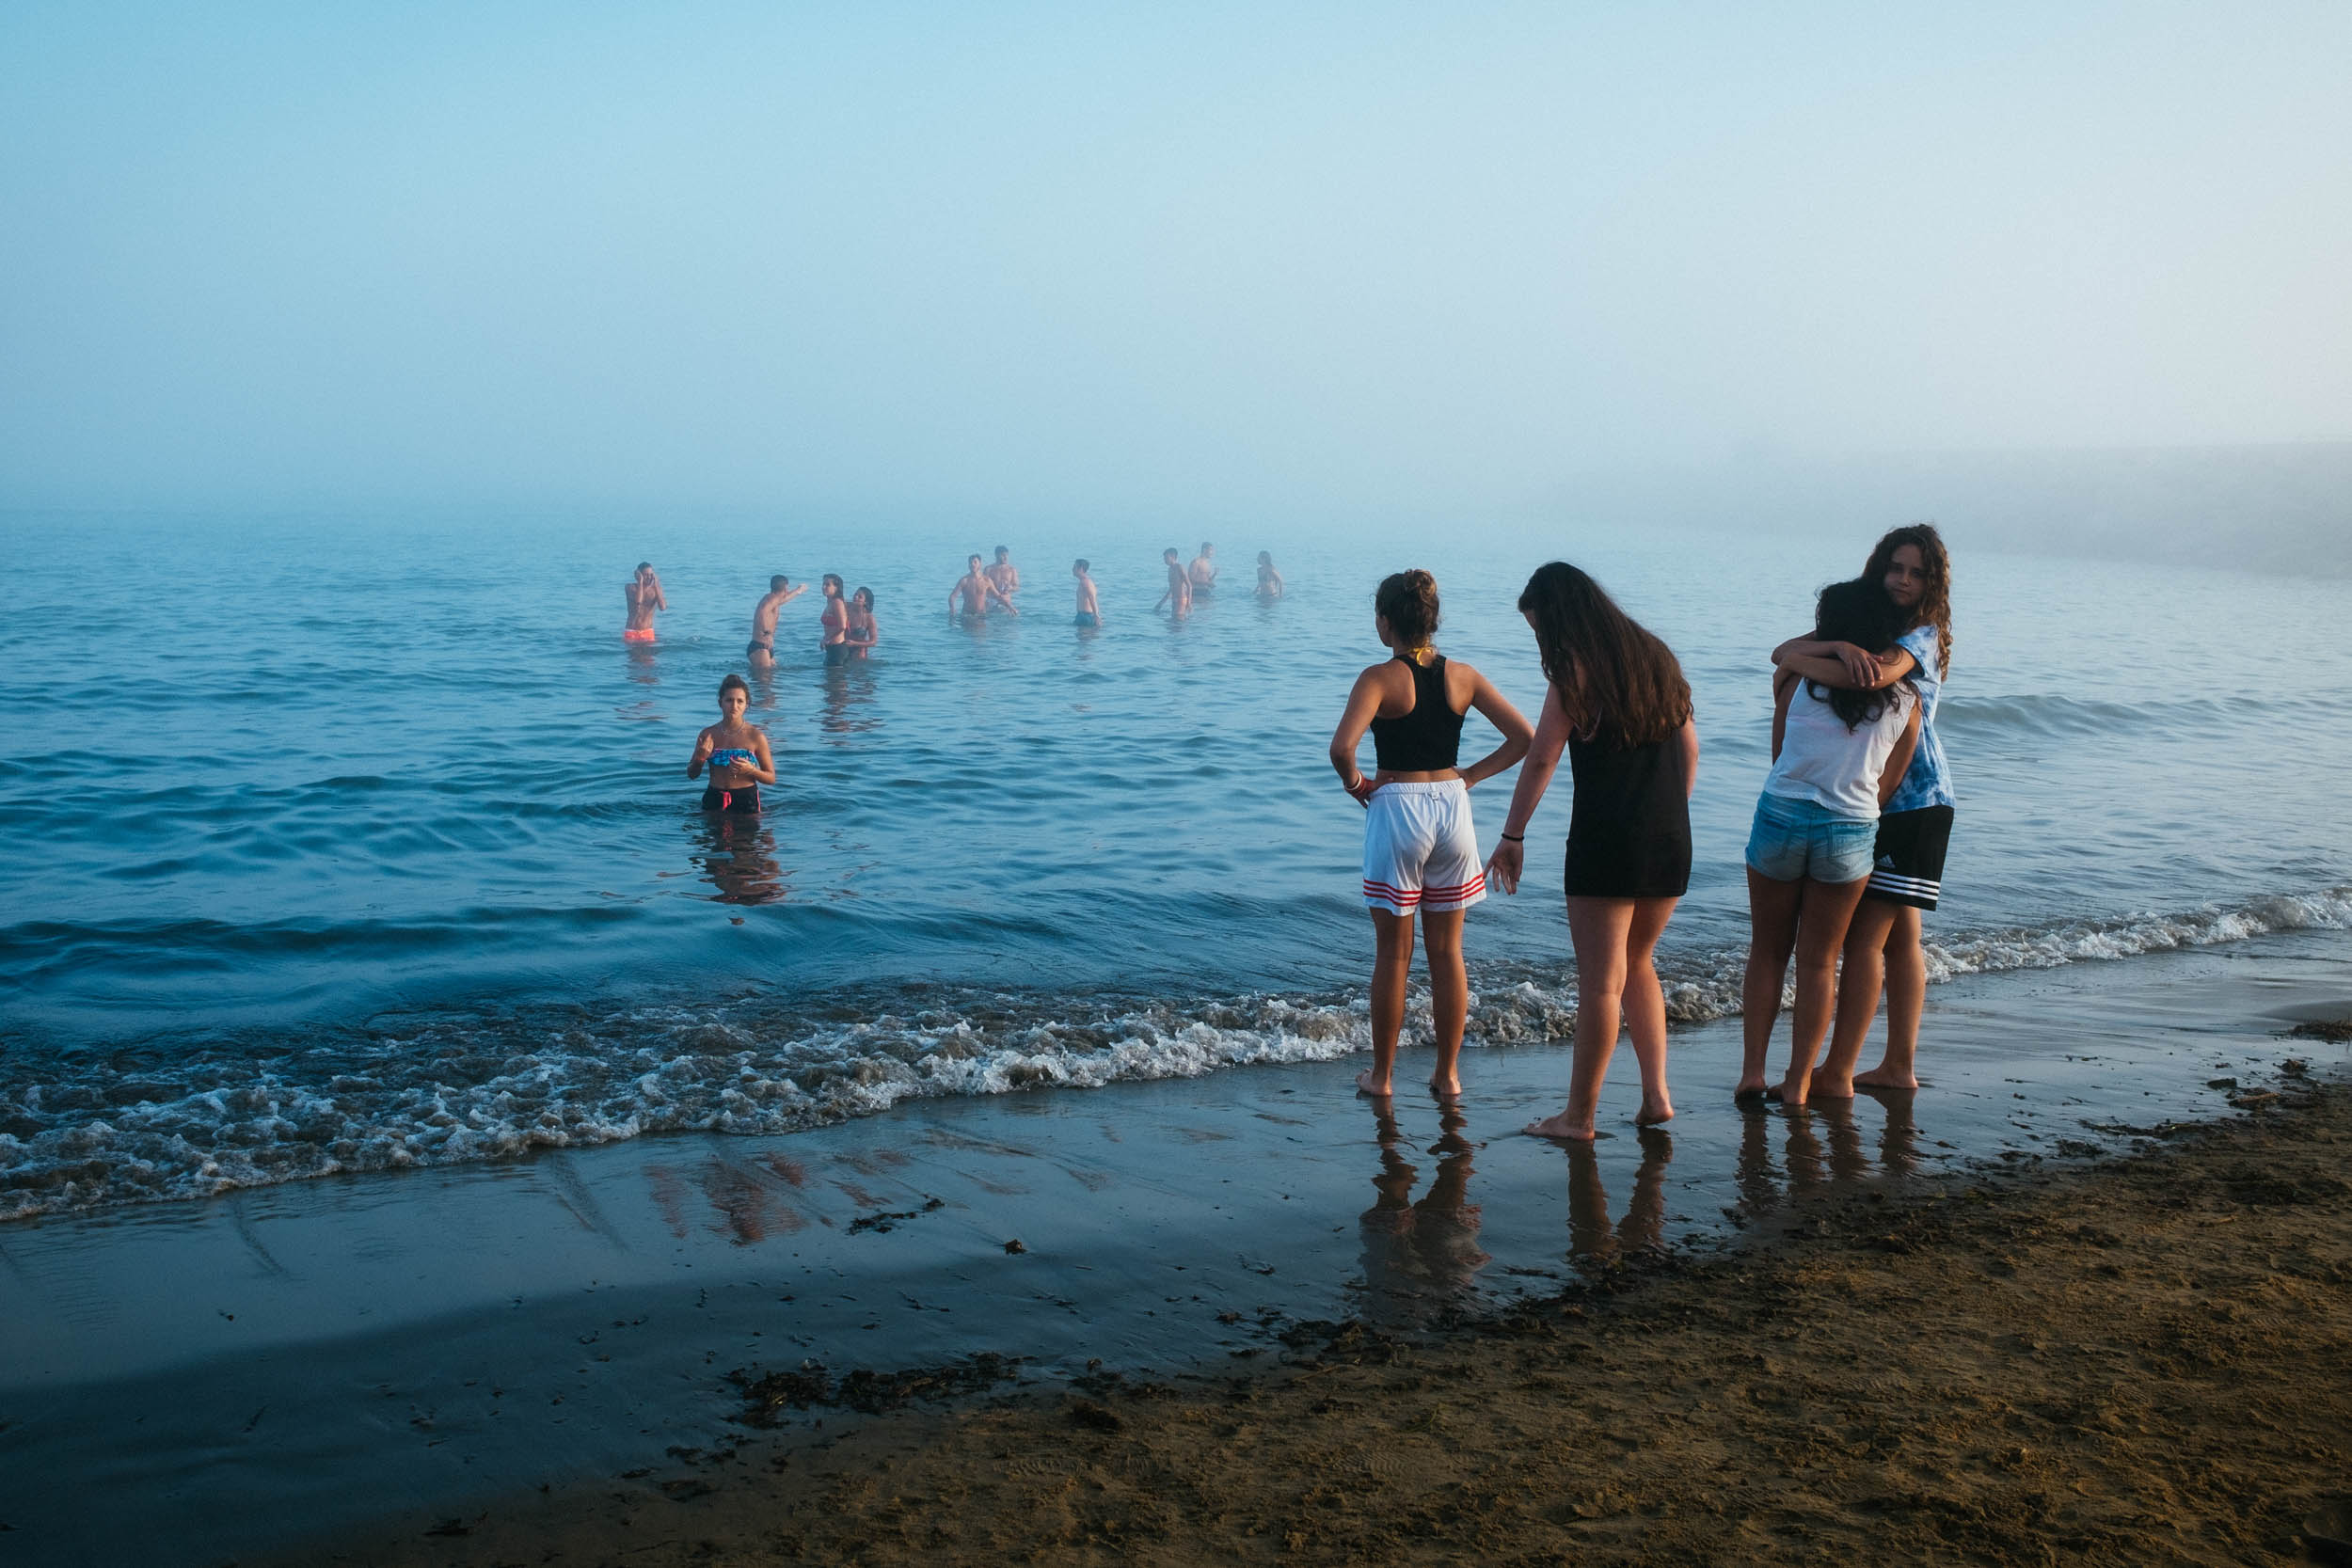 Giuliano-Berti-Lupa-Ragusa-Sicily-Mist-2.jpg